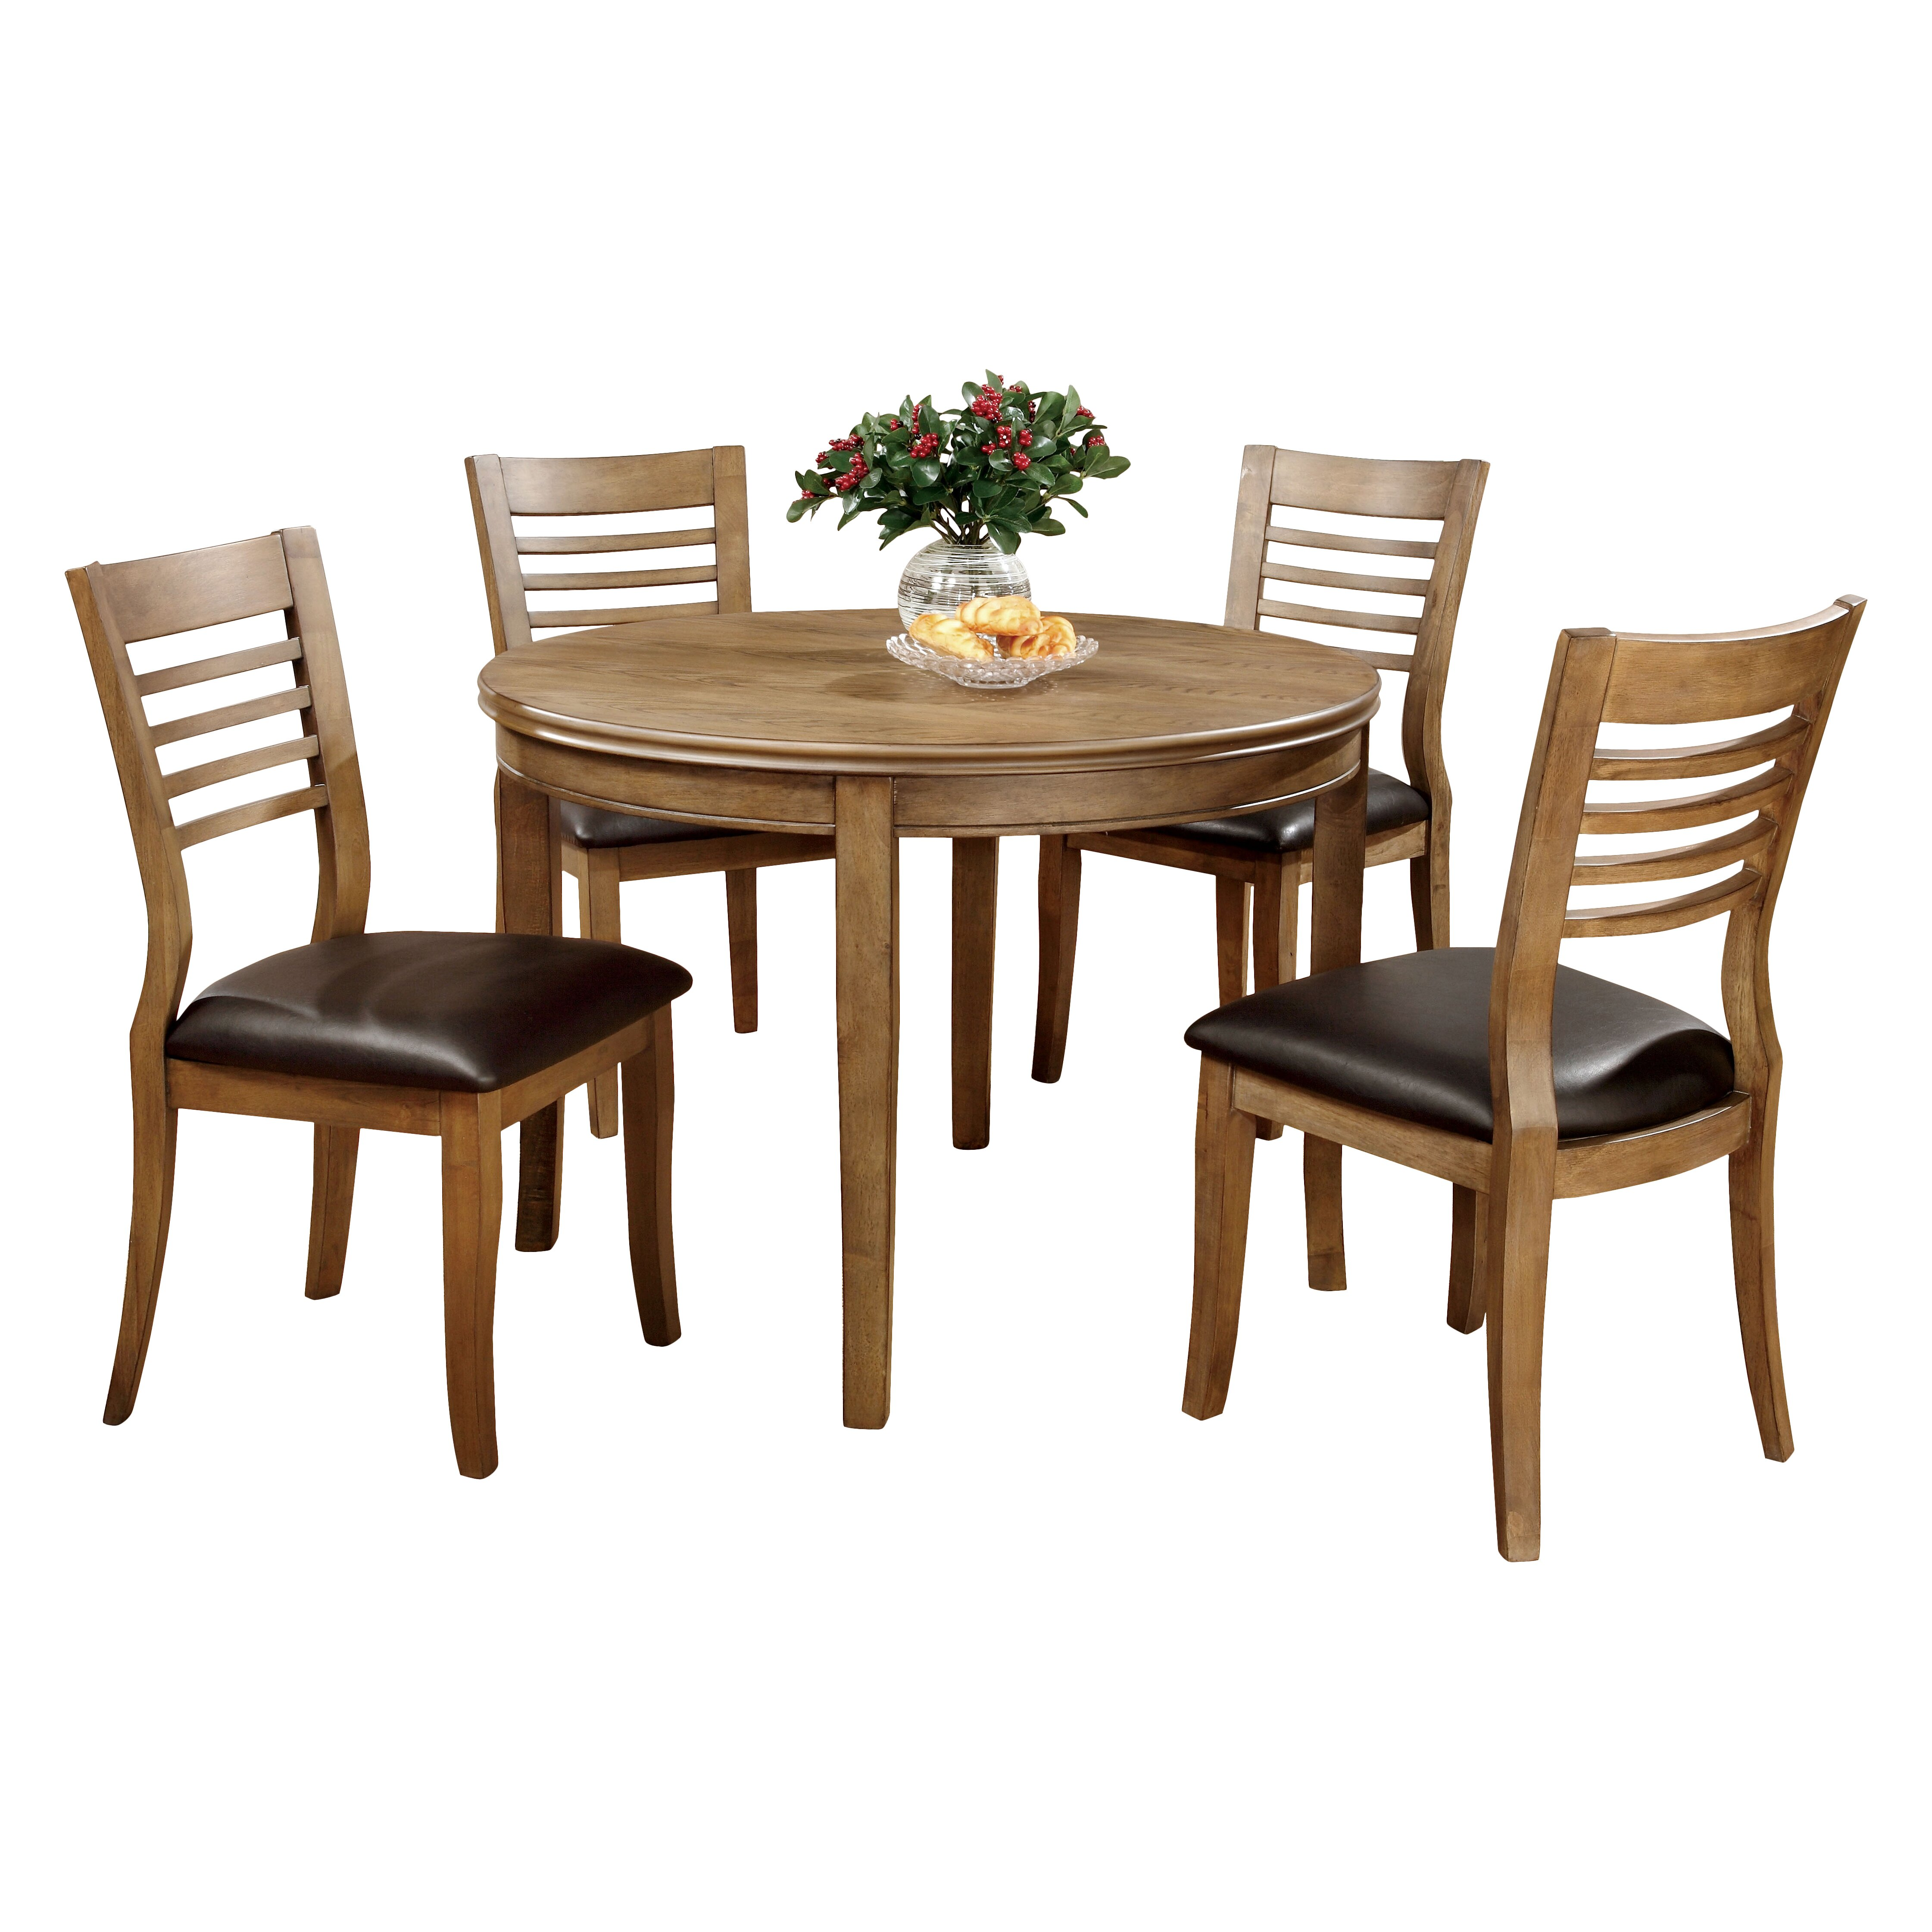 Hokku designs natura 5 piece dining set wayfair for Hokku designs dining room furniture